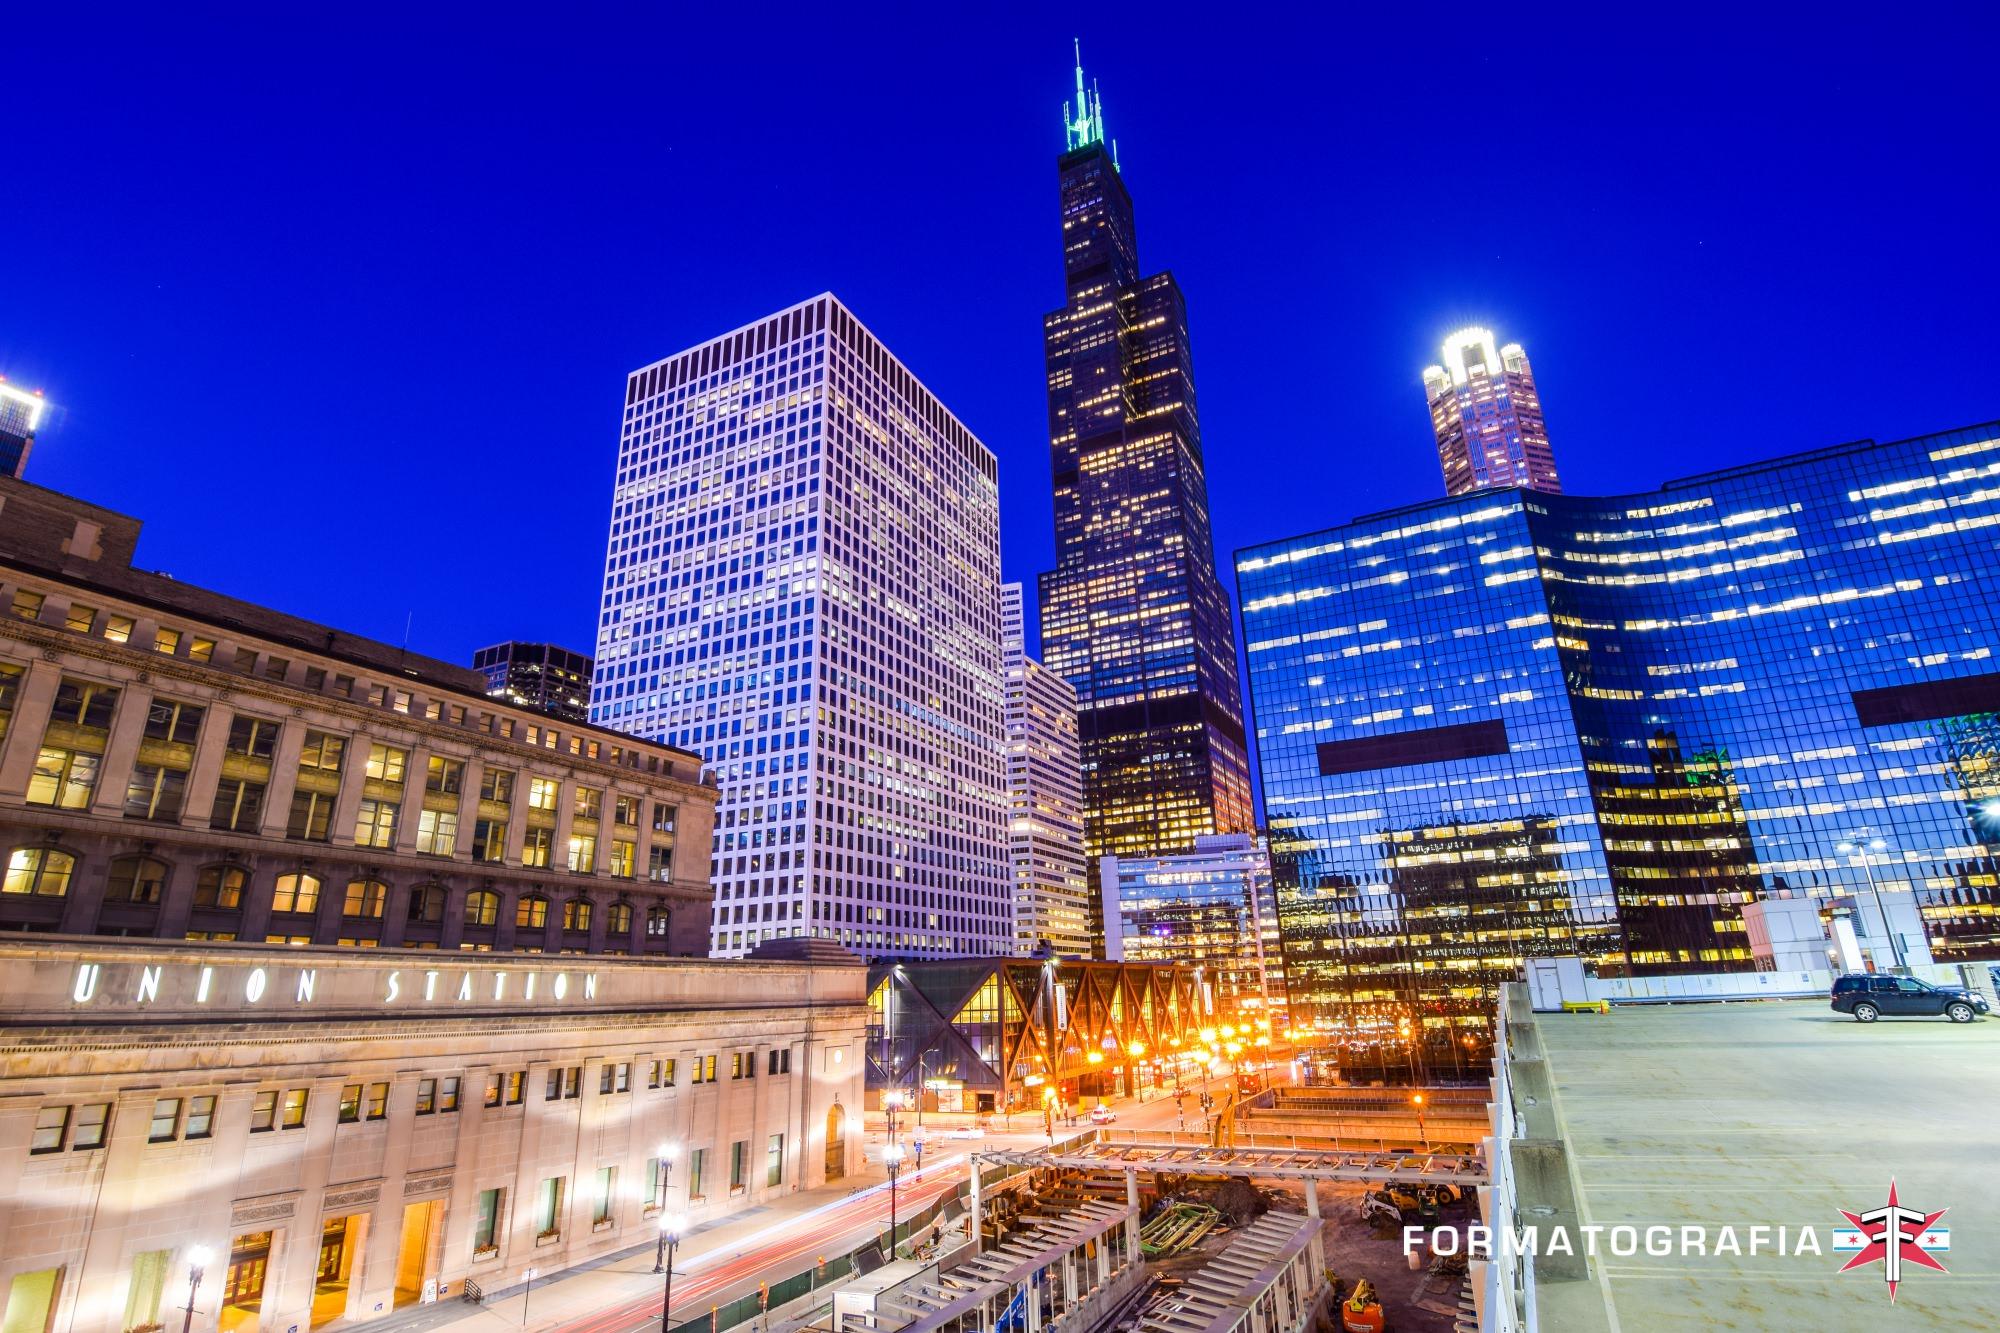 eric formato chicago photographer fall update city architecture shots20160317-DSC_0624-2.jpg